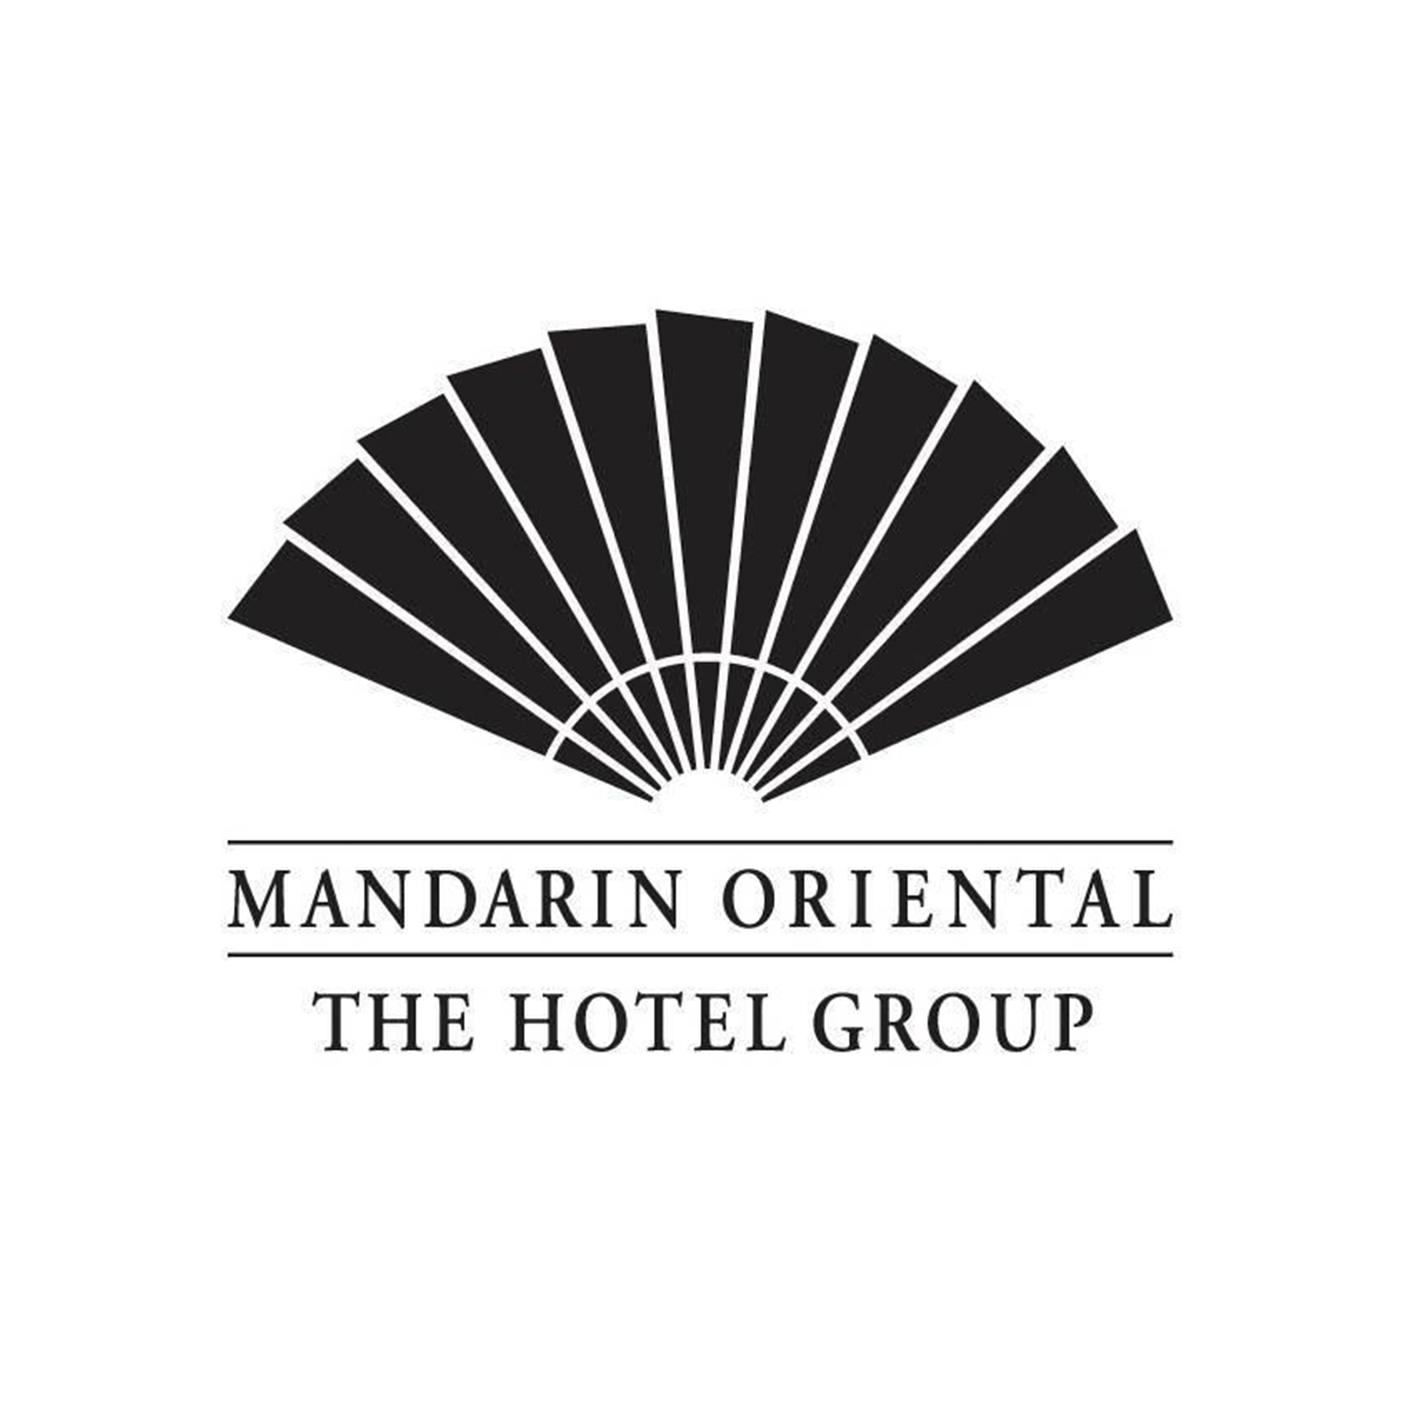 Mandarin Oriental Hotels.png